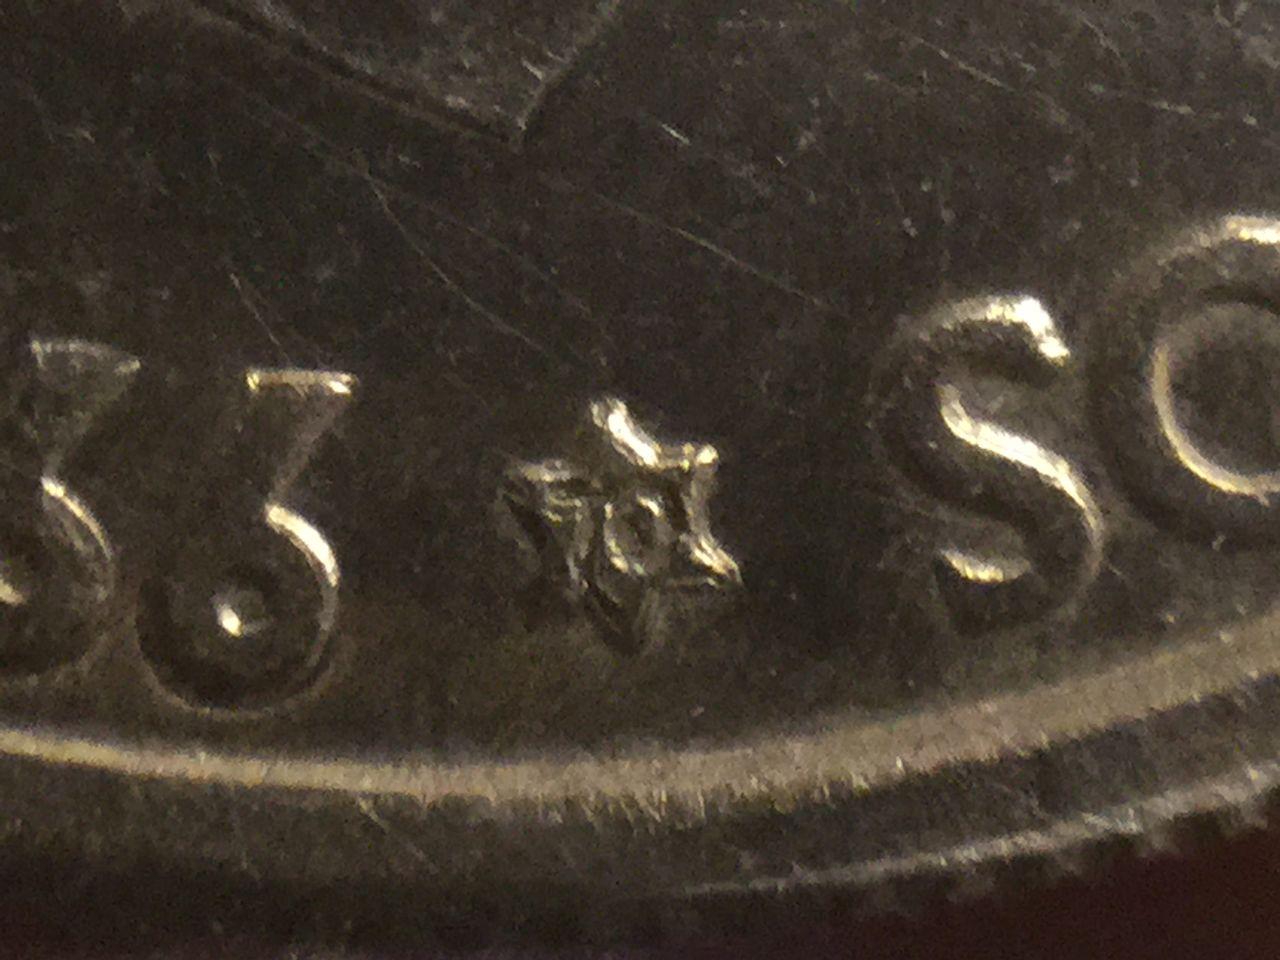 50 céntimos 1966 *70 Estado Español - Página 2 IMG_0206